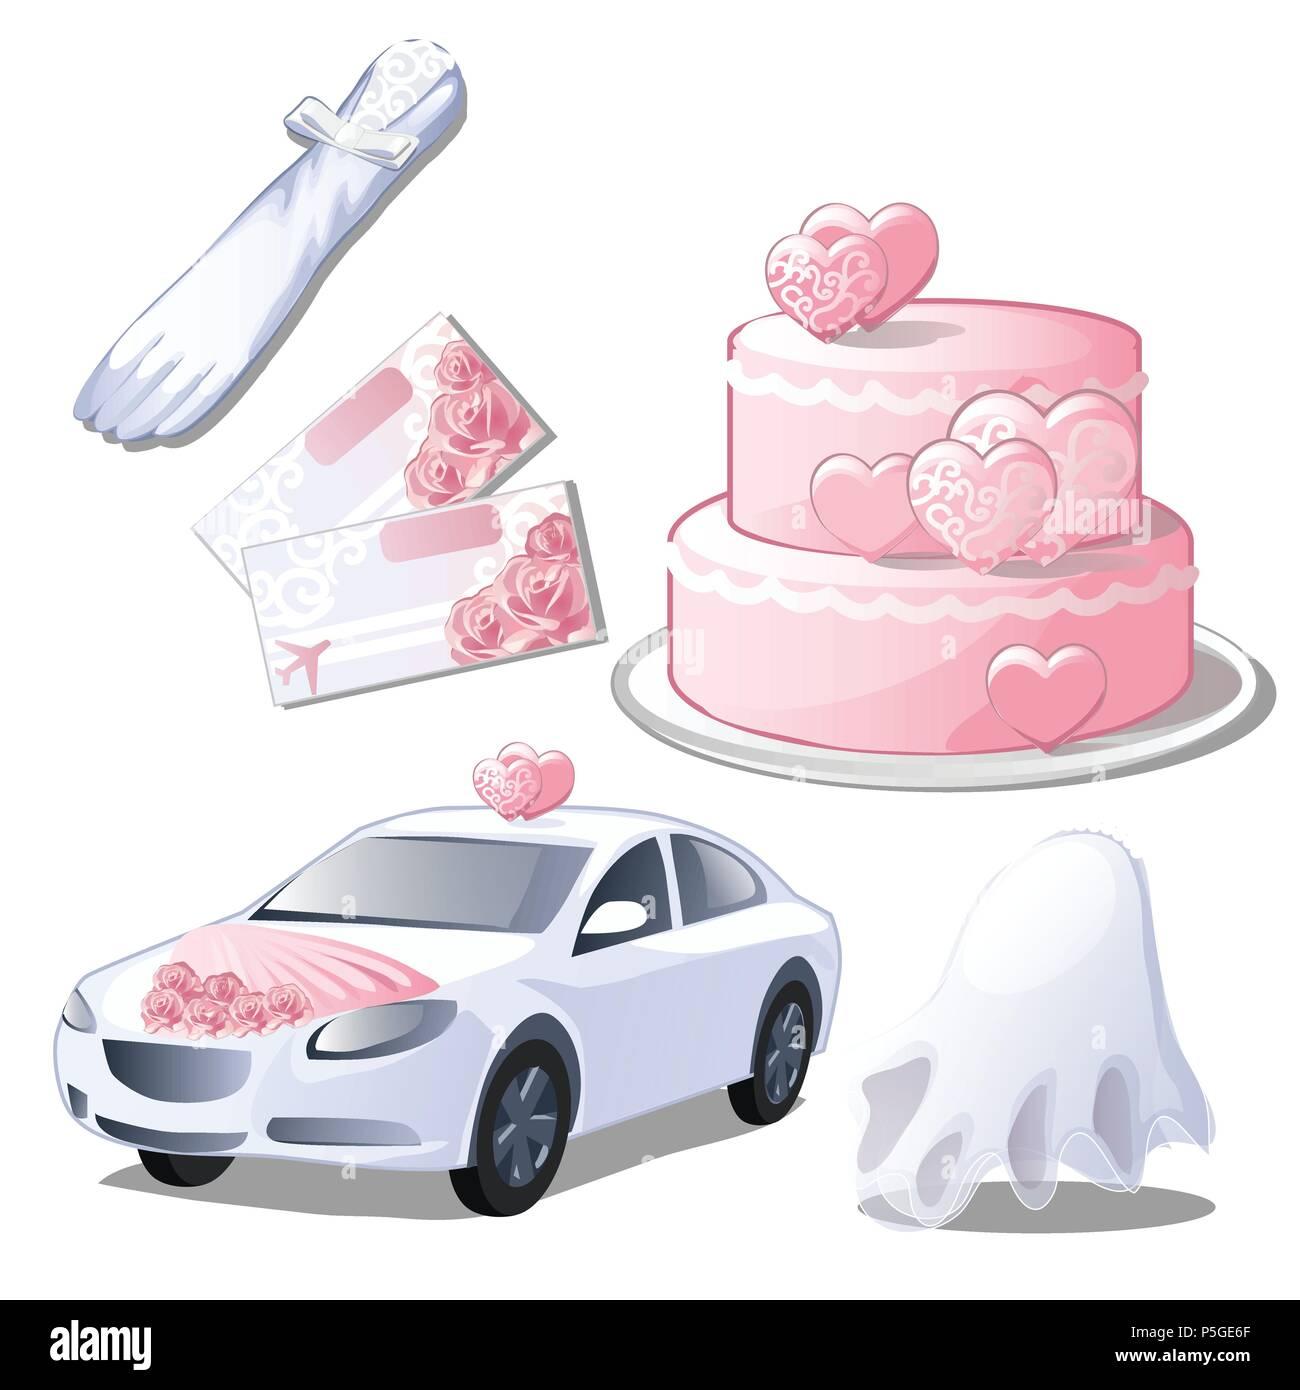 Set wedding accessories isolated on white background. Glove, wedding ...